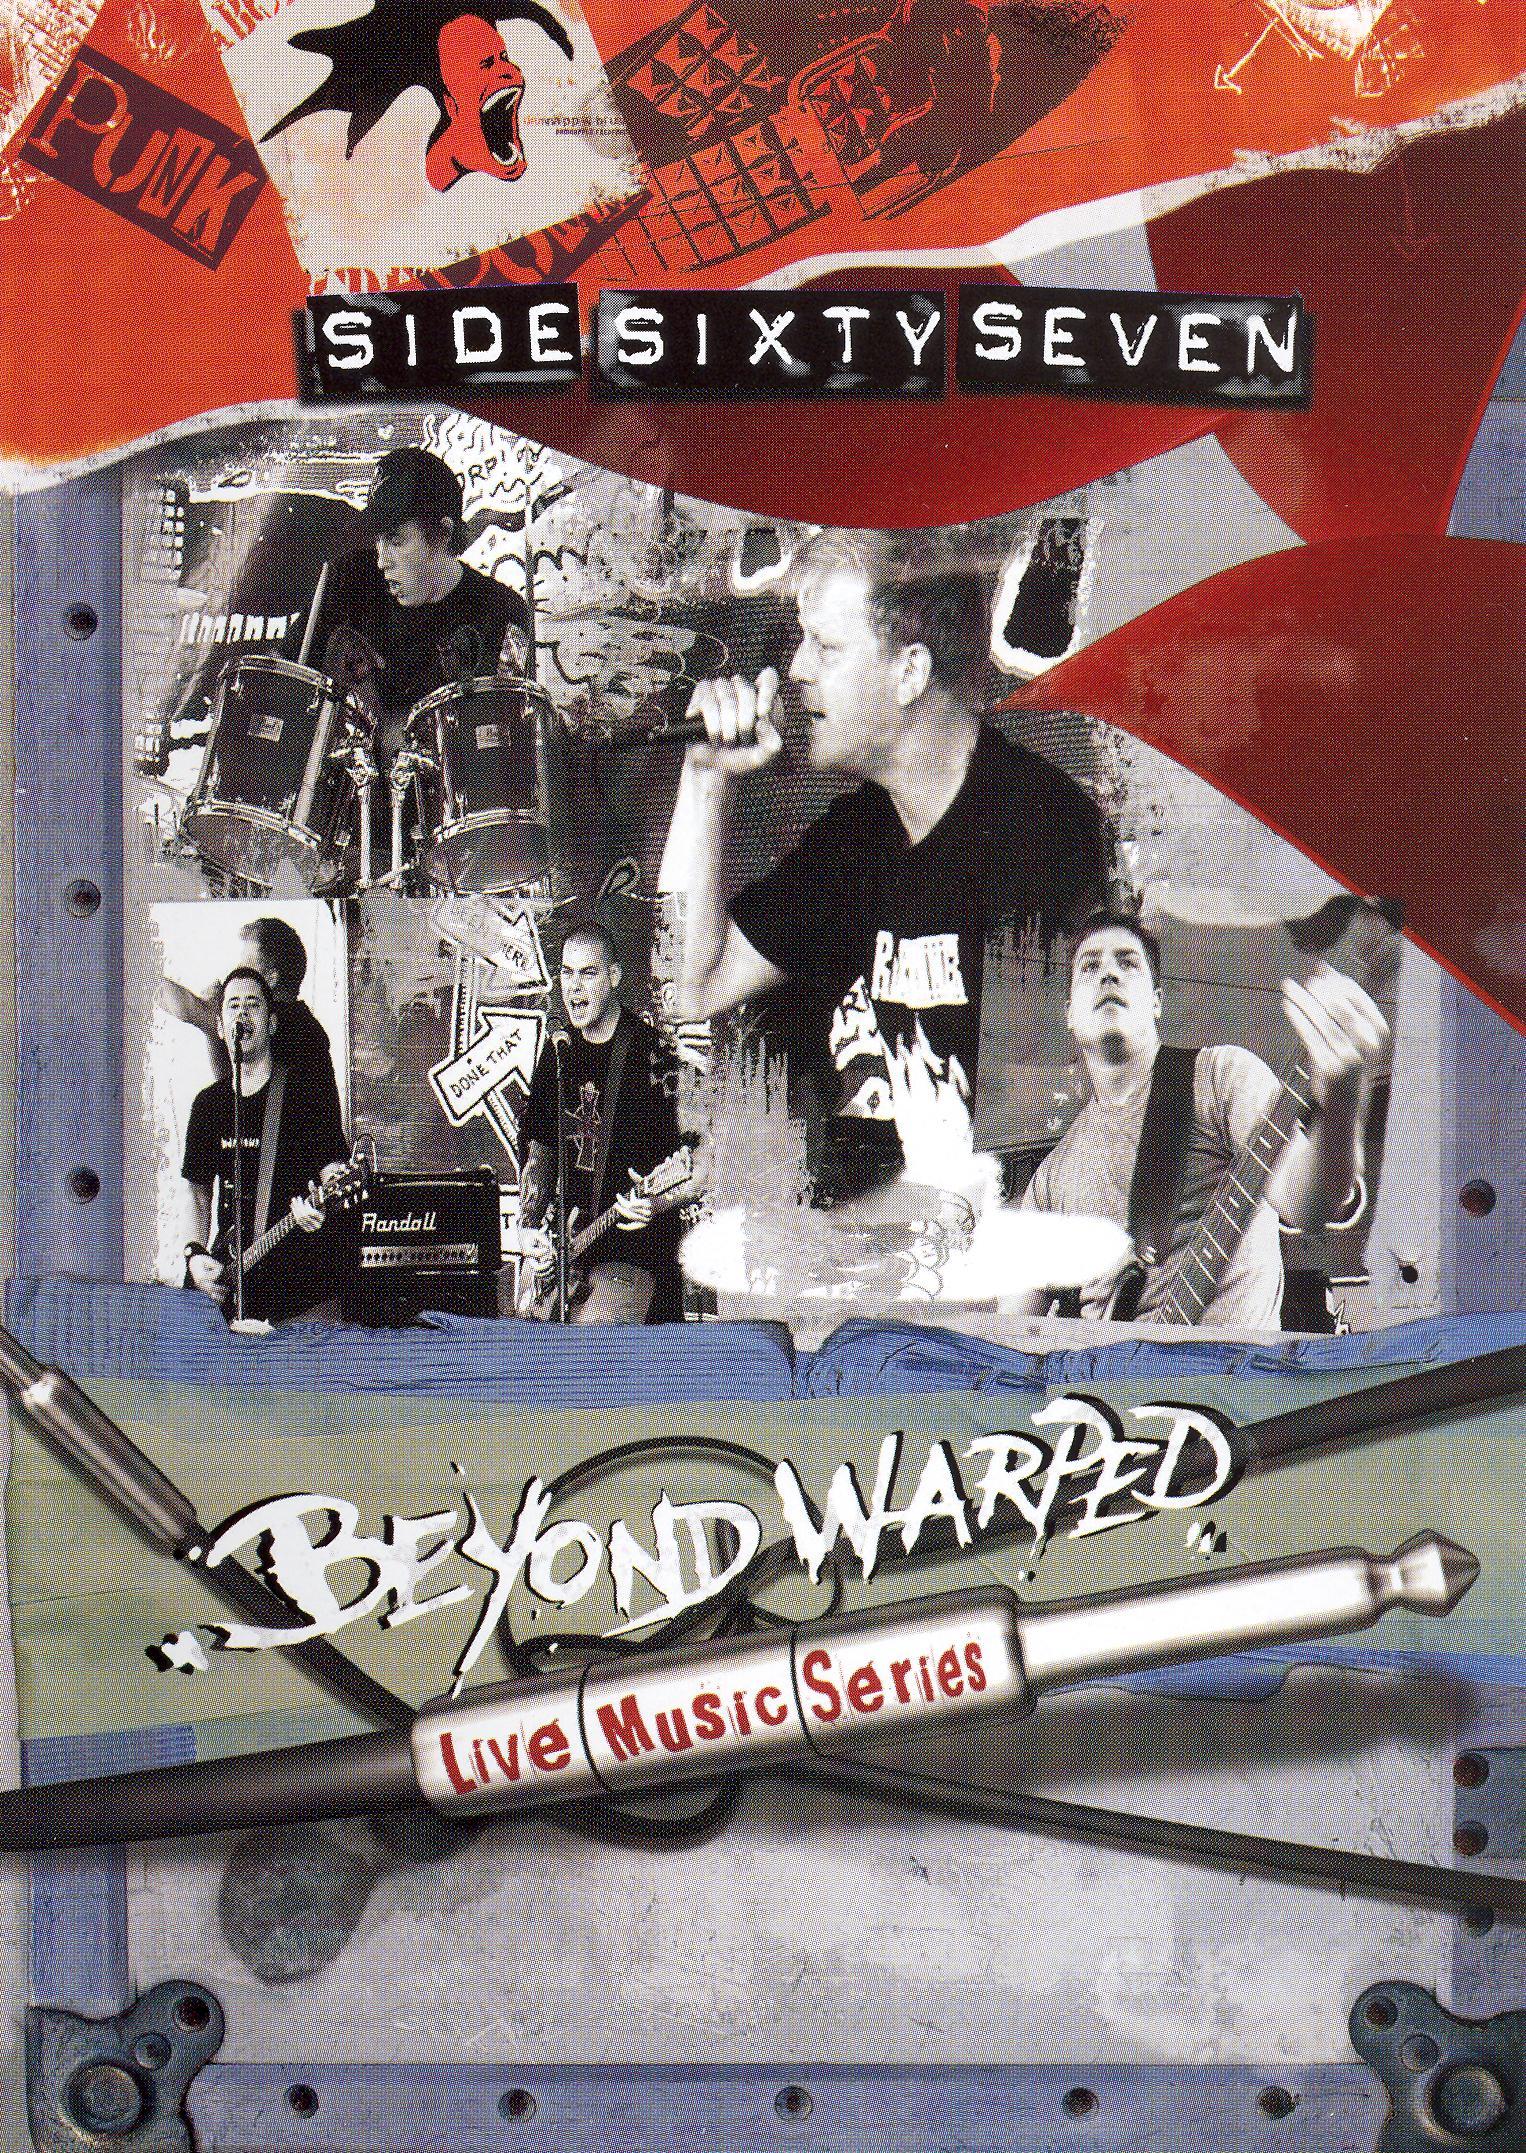 Beyond Warped: Side Sixtyseven